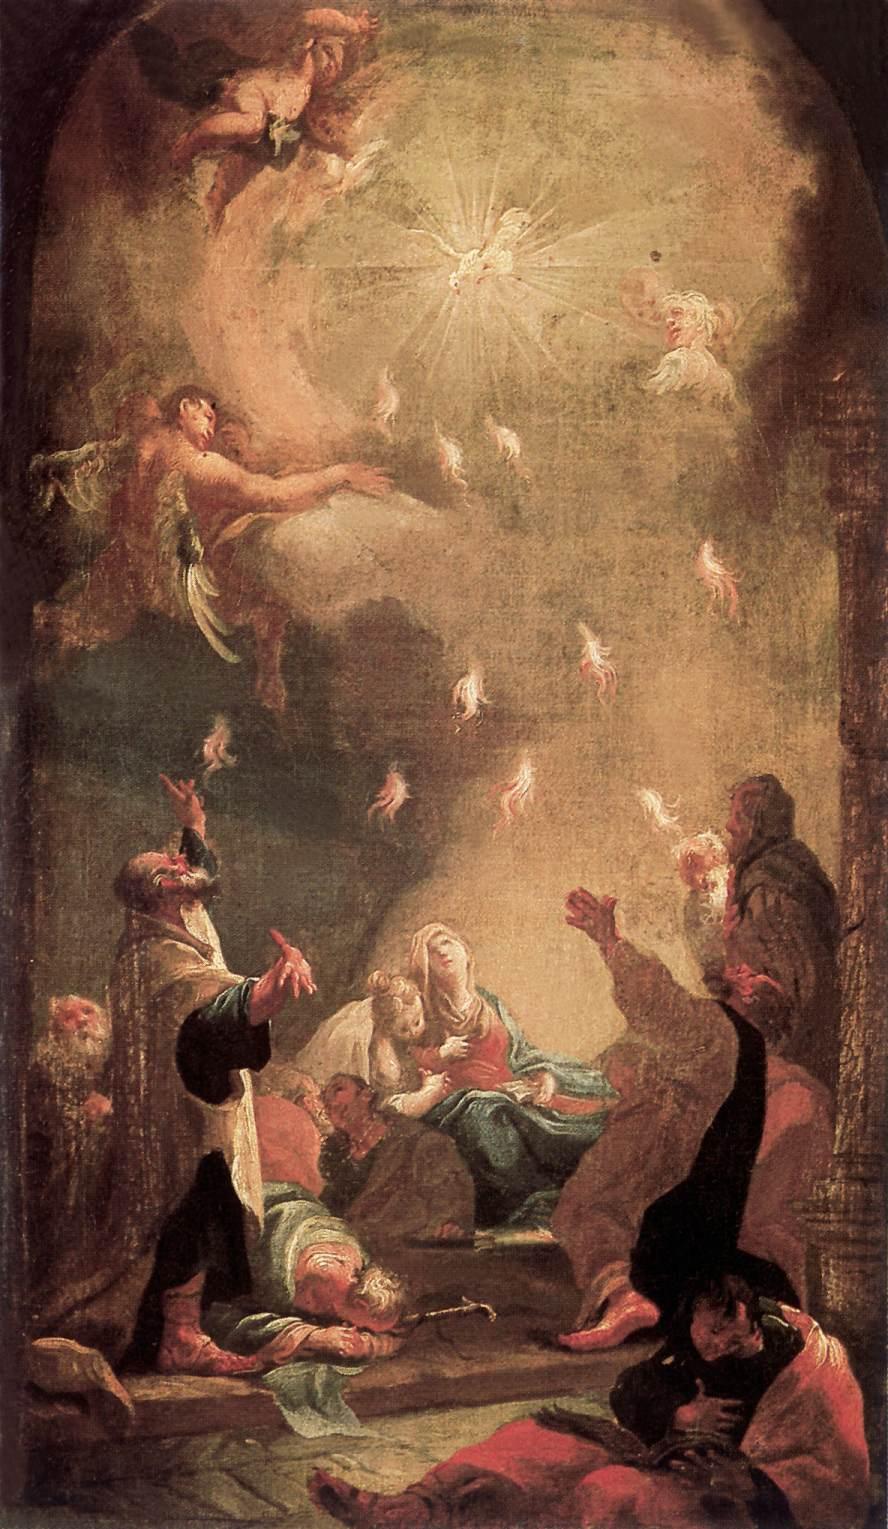 http://upload.wikimedia.org/wikipedia/commons/d/dc/Dorffmaister,_Istv%C3%A1n_-_Pentecost_(1782).jpg